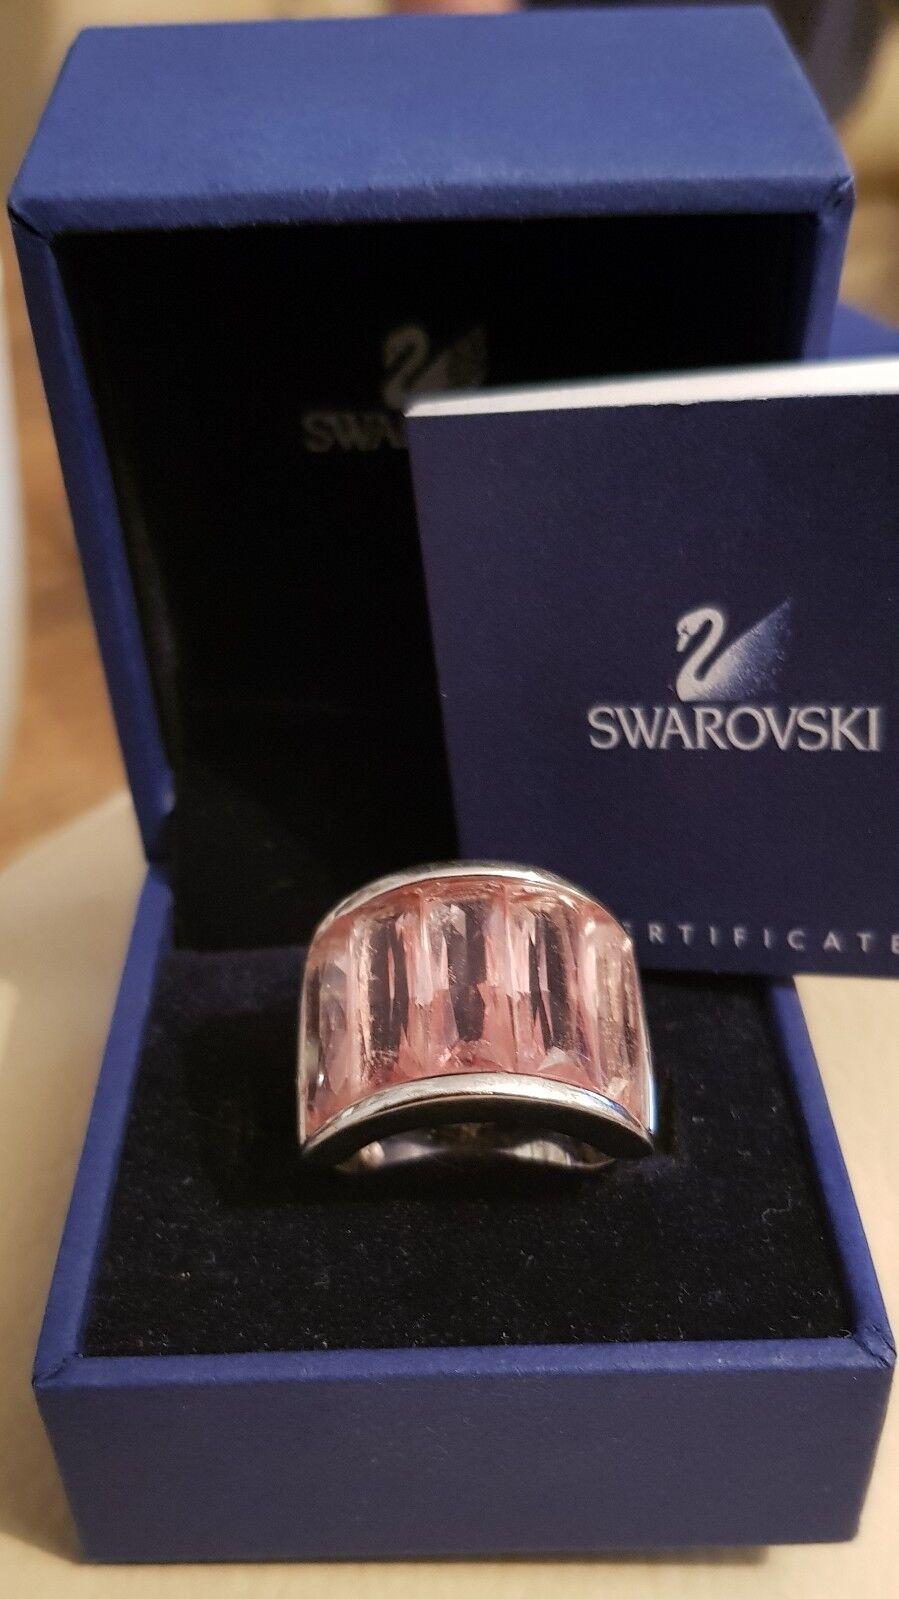 Genuine Swarovski pink crystal ring in box with certificate, Stunning swan stamp